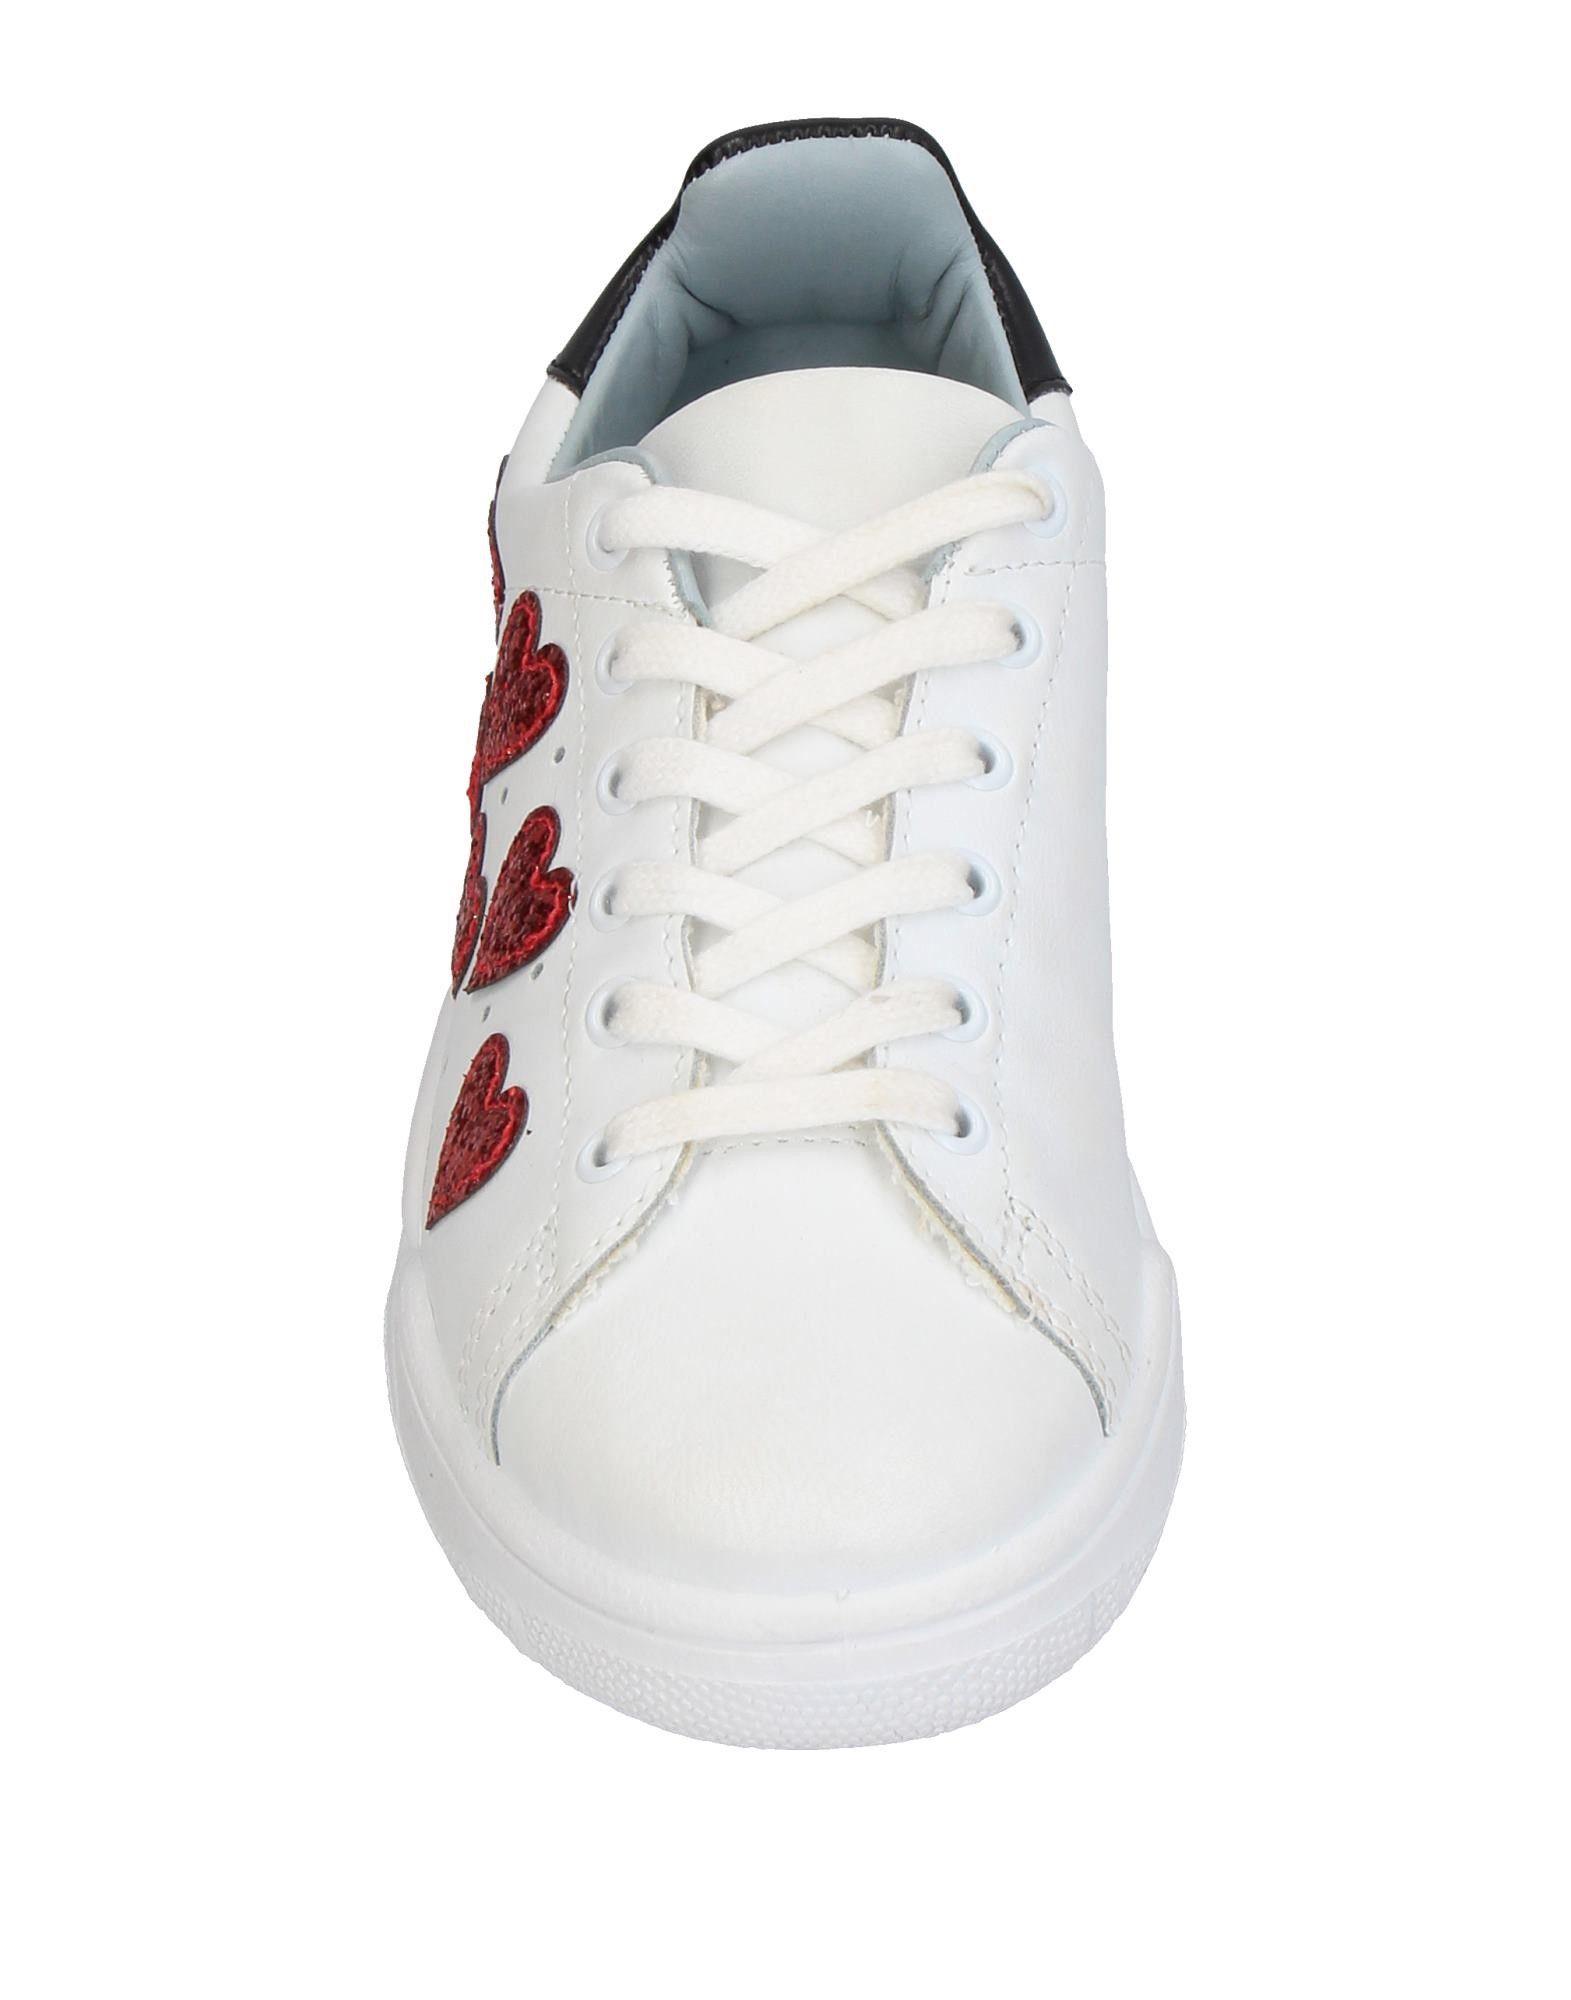 Chiara Ferragni Sneakers Damen   11415265JK 6e9706